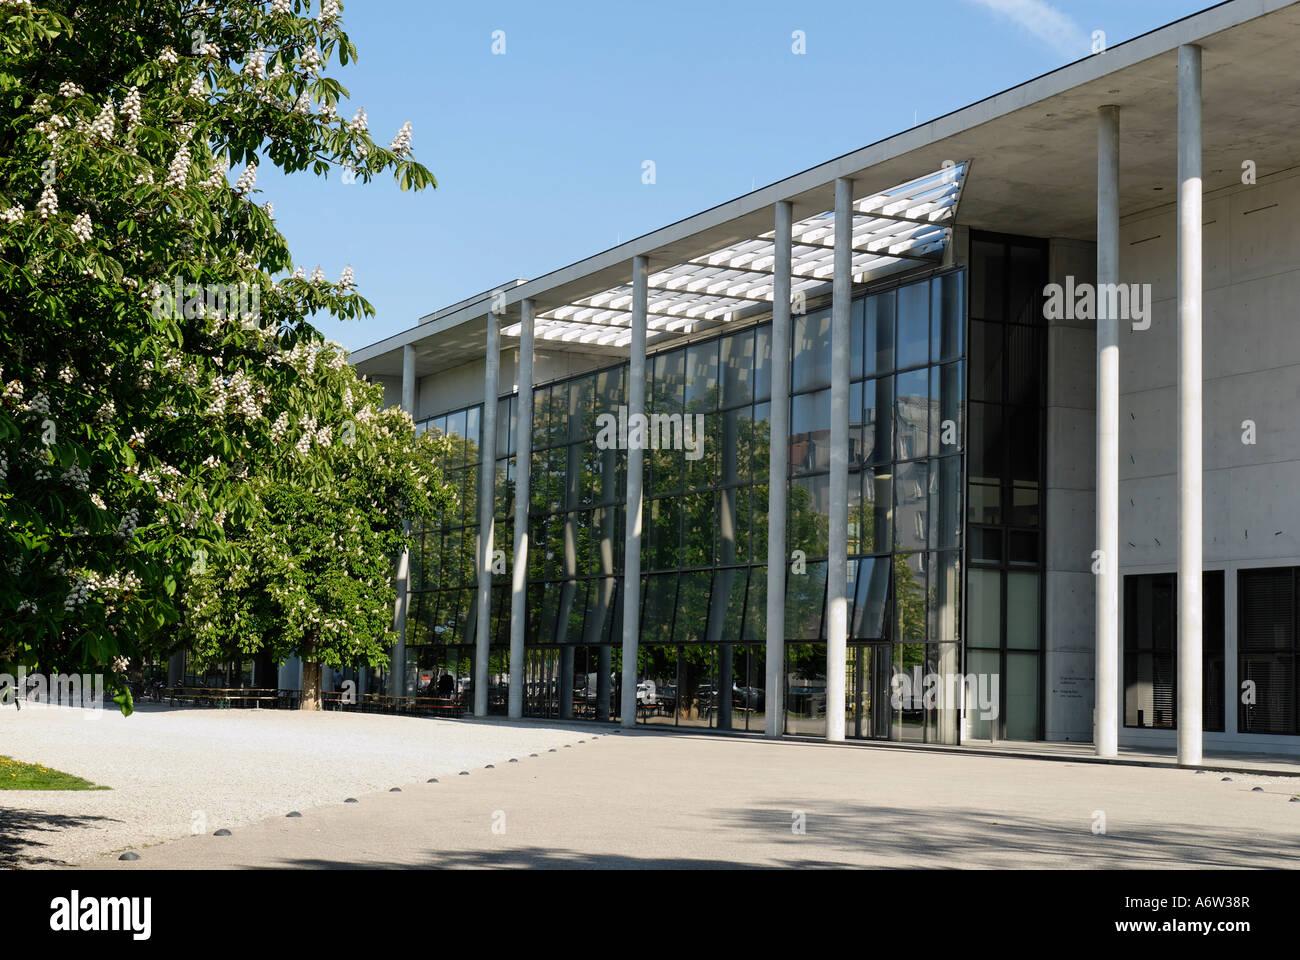 pinakothek der moderne munich bavaria germany stockfoto lizenzfreies bild 11651350 alamy. Black Bedroom Furniture Sets. Home Design Ideas